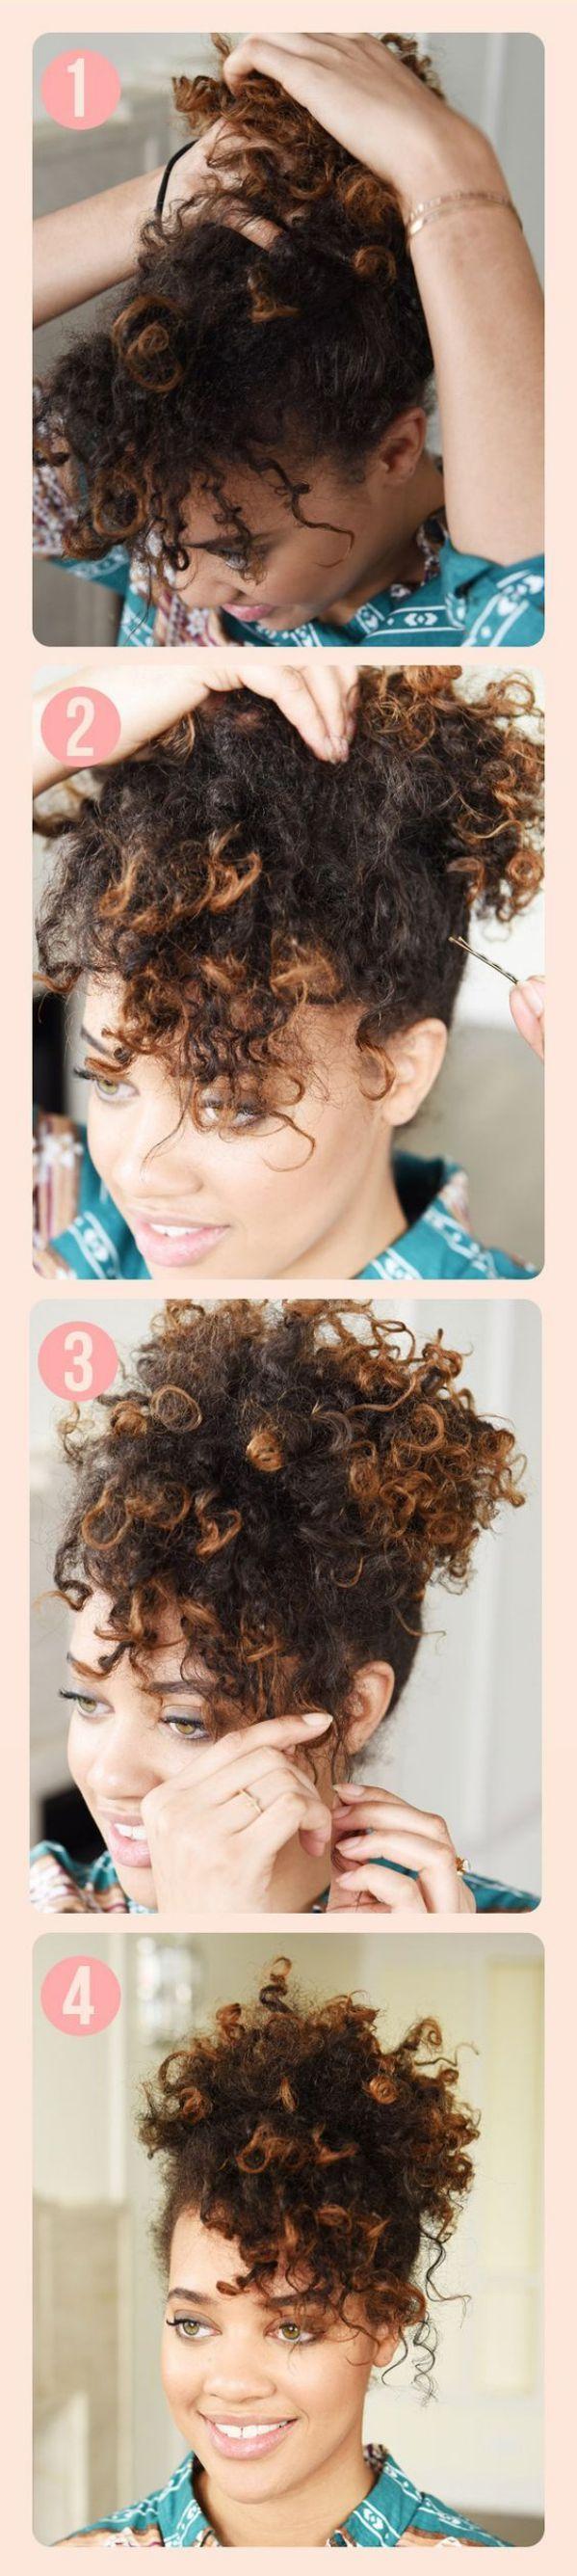 Peinados Pelo Corto Y Rizado Cortes De Pelo Rizado Corto Para